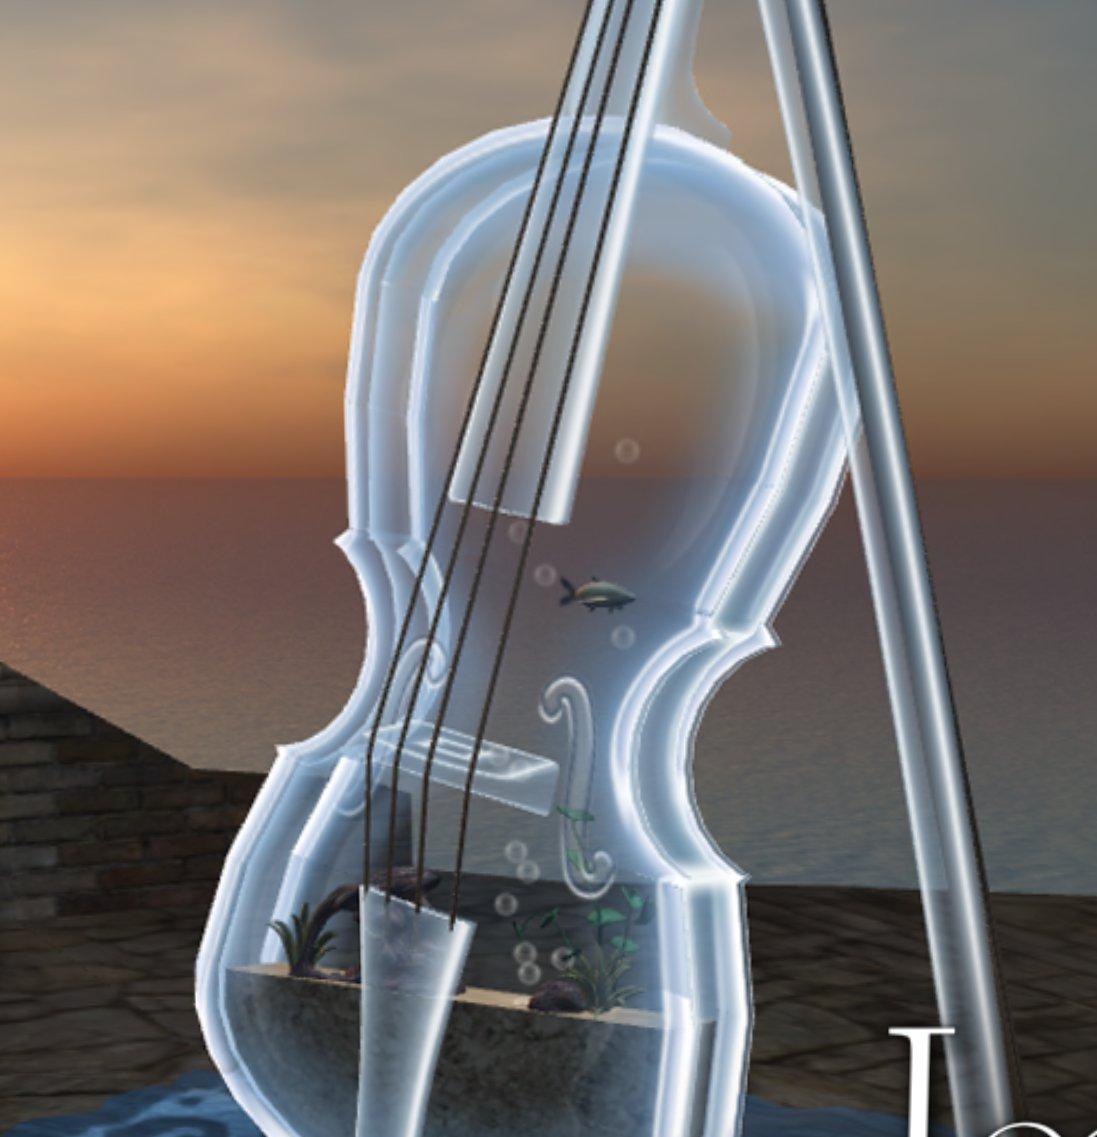 Glass Violin Wallpaper a 64 Prim Glass Violin